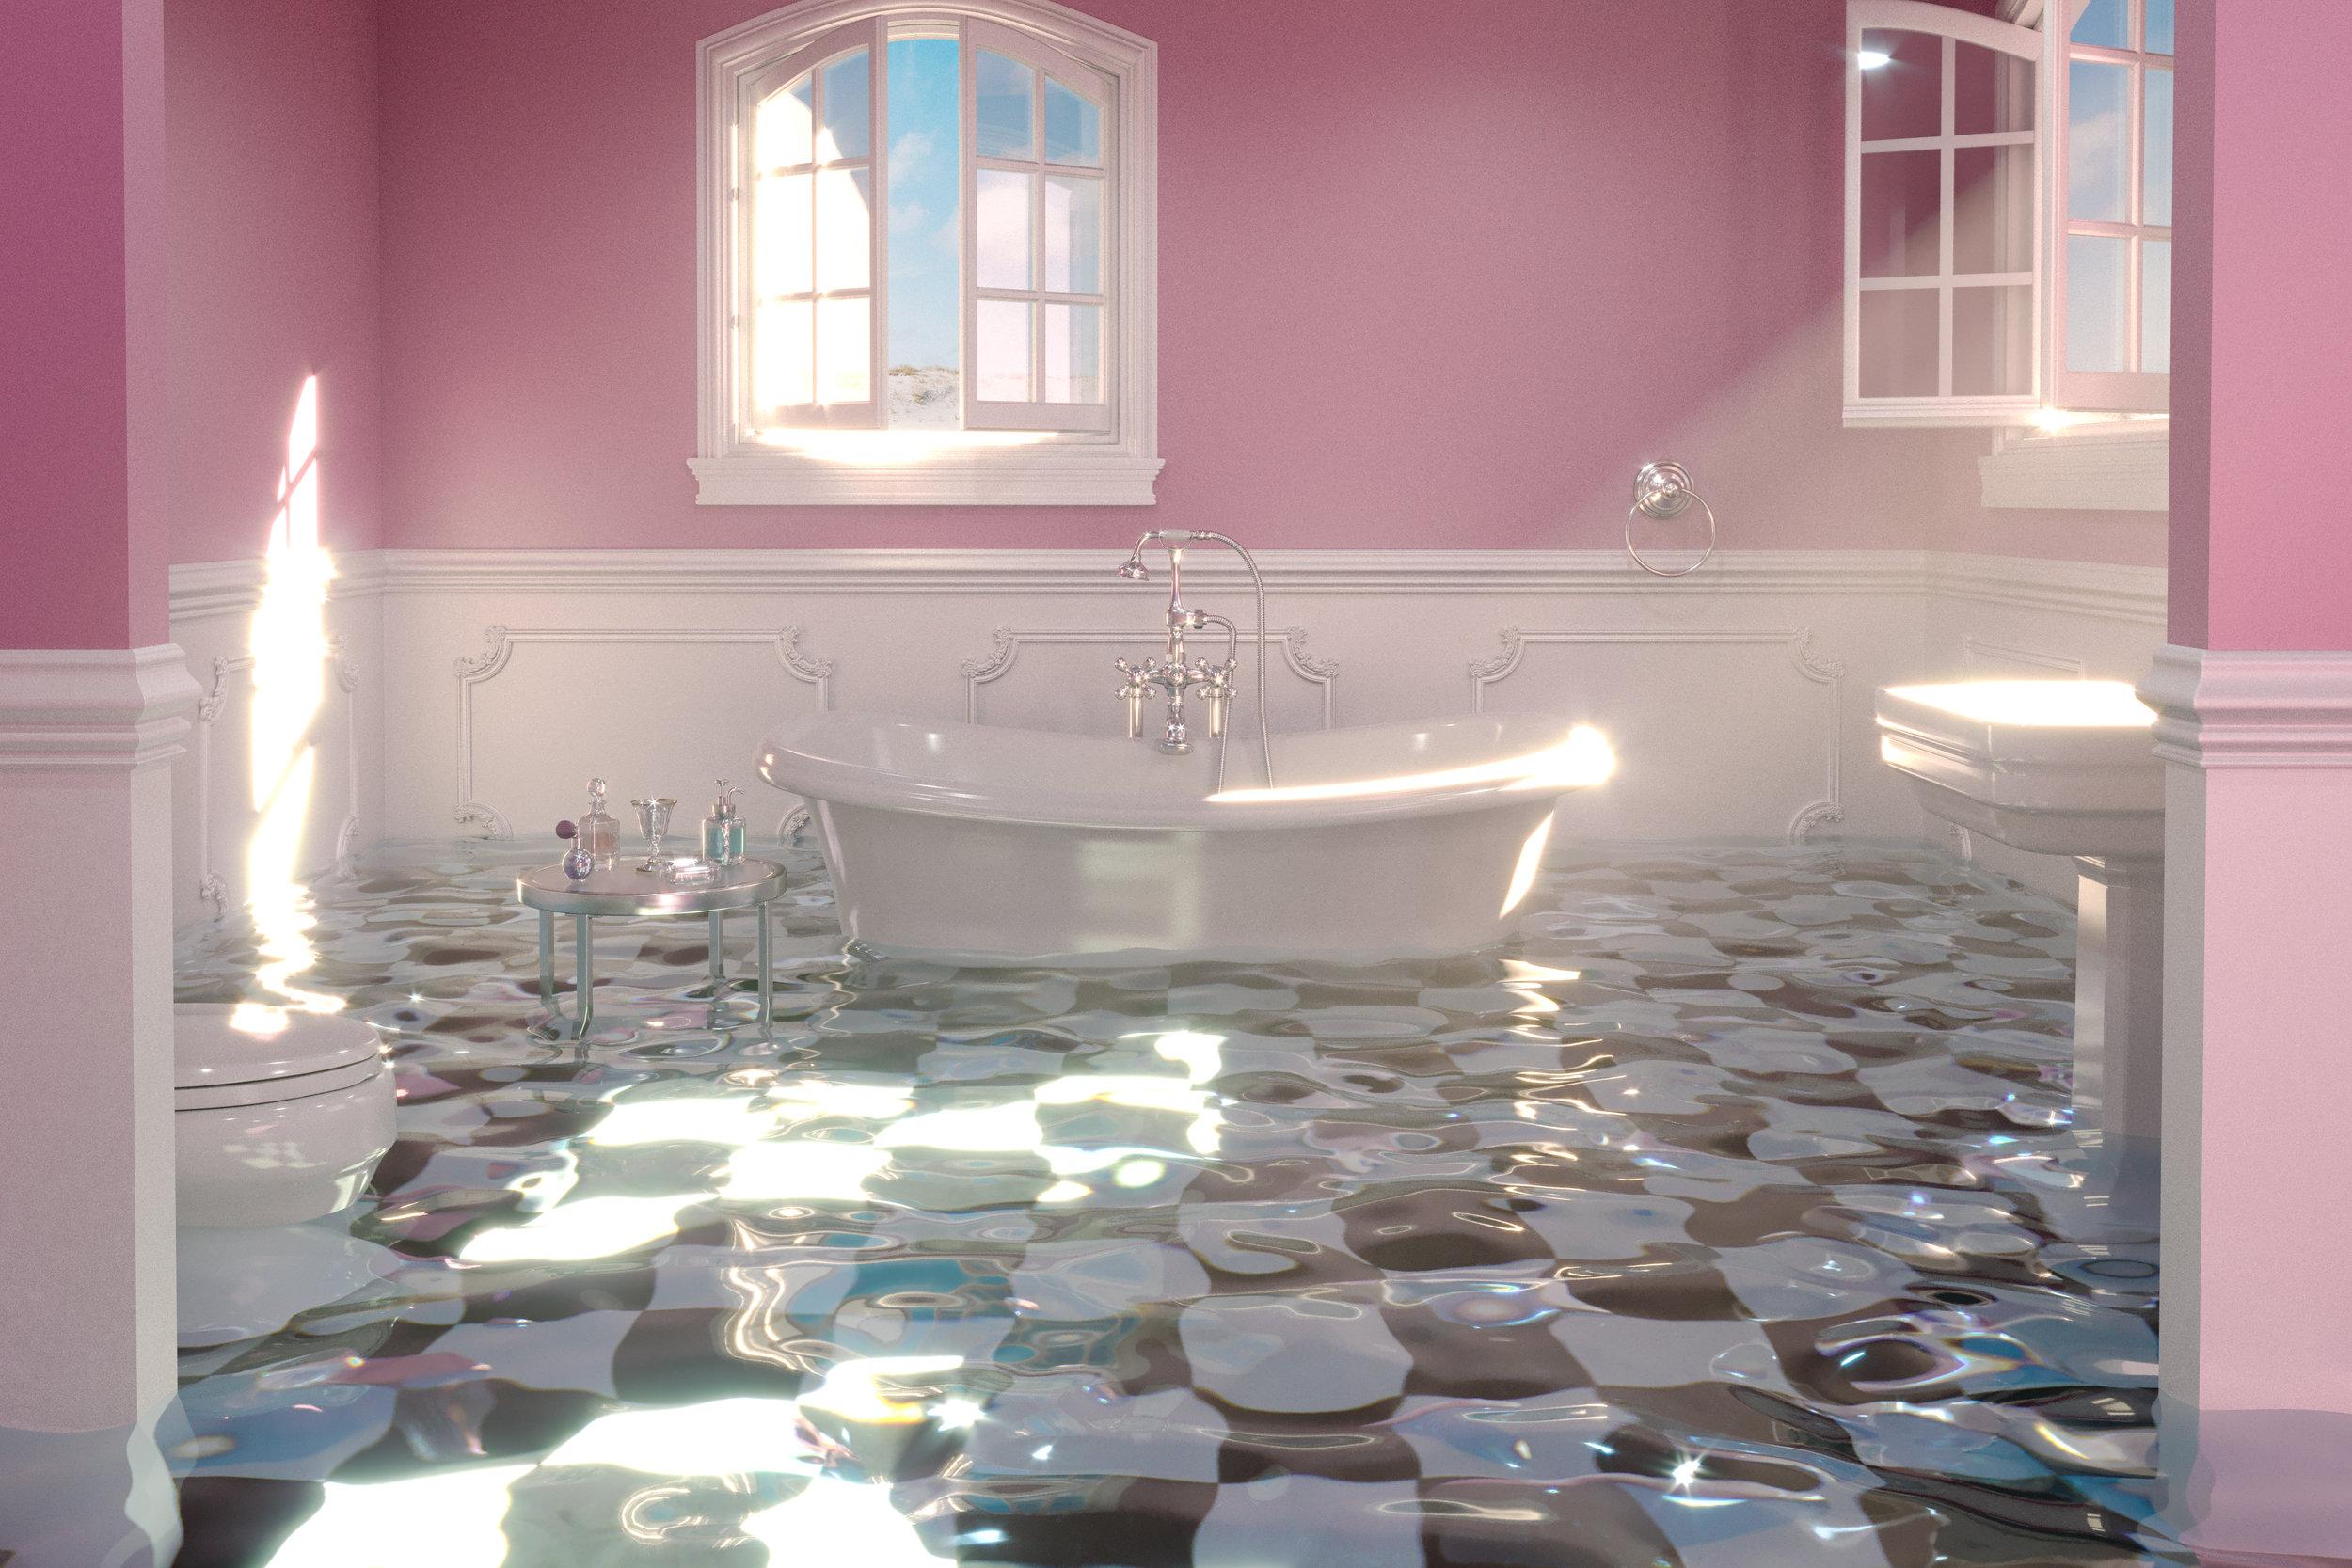 Bathing Culture